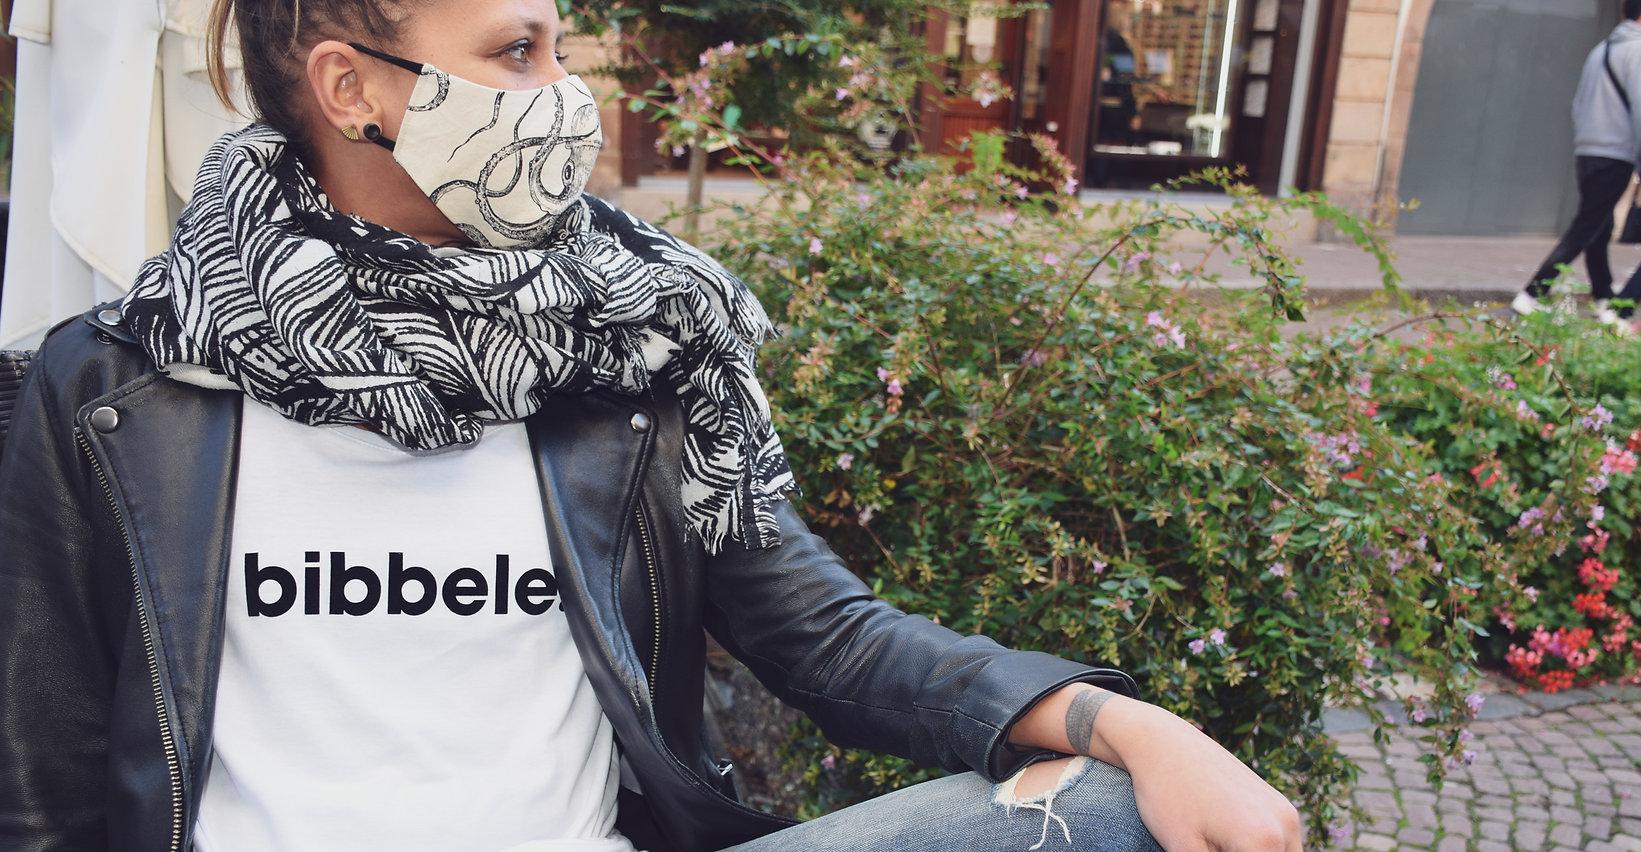 le-labograph-tee-shirt-bibbele-au-bar2-web2.jpg